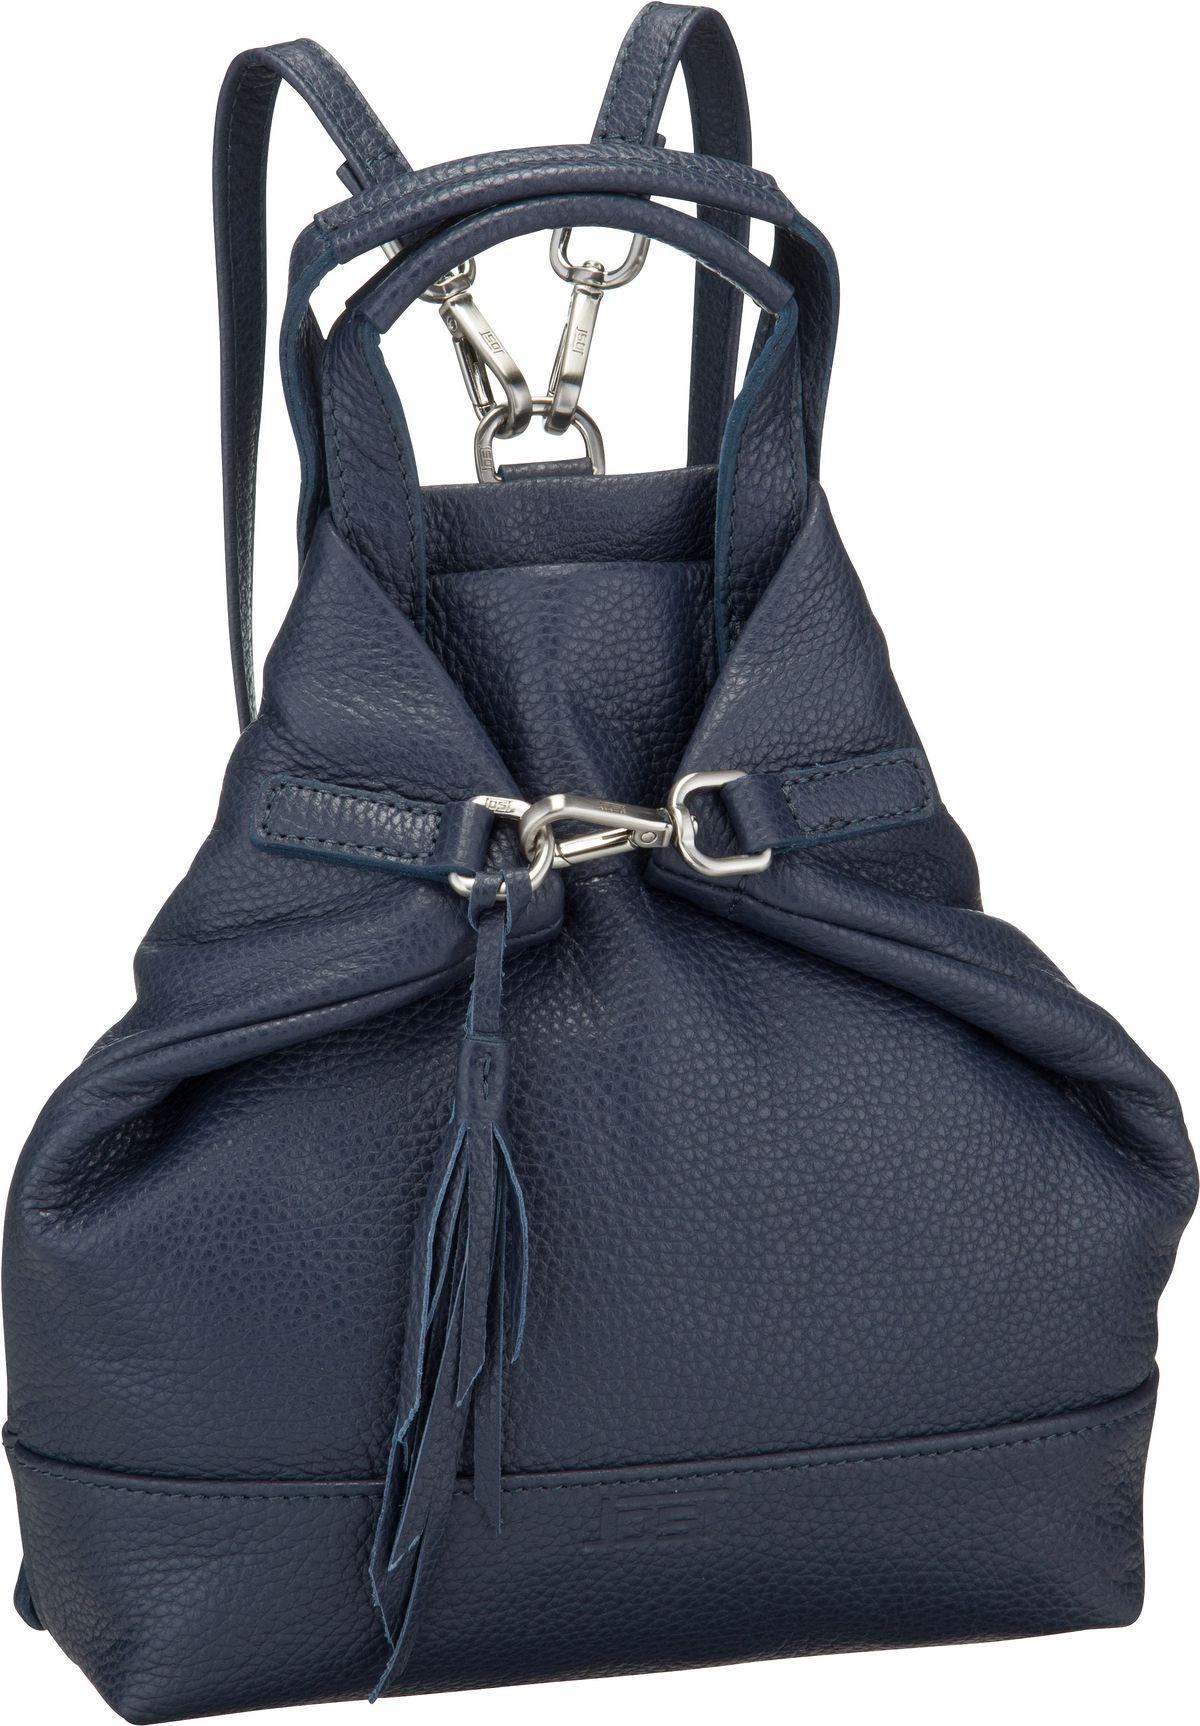 Rucksack / Daypack Vika 1840 x-Change Bag 3in1 Mini Navy